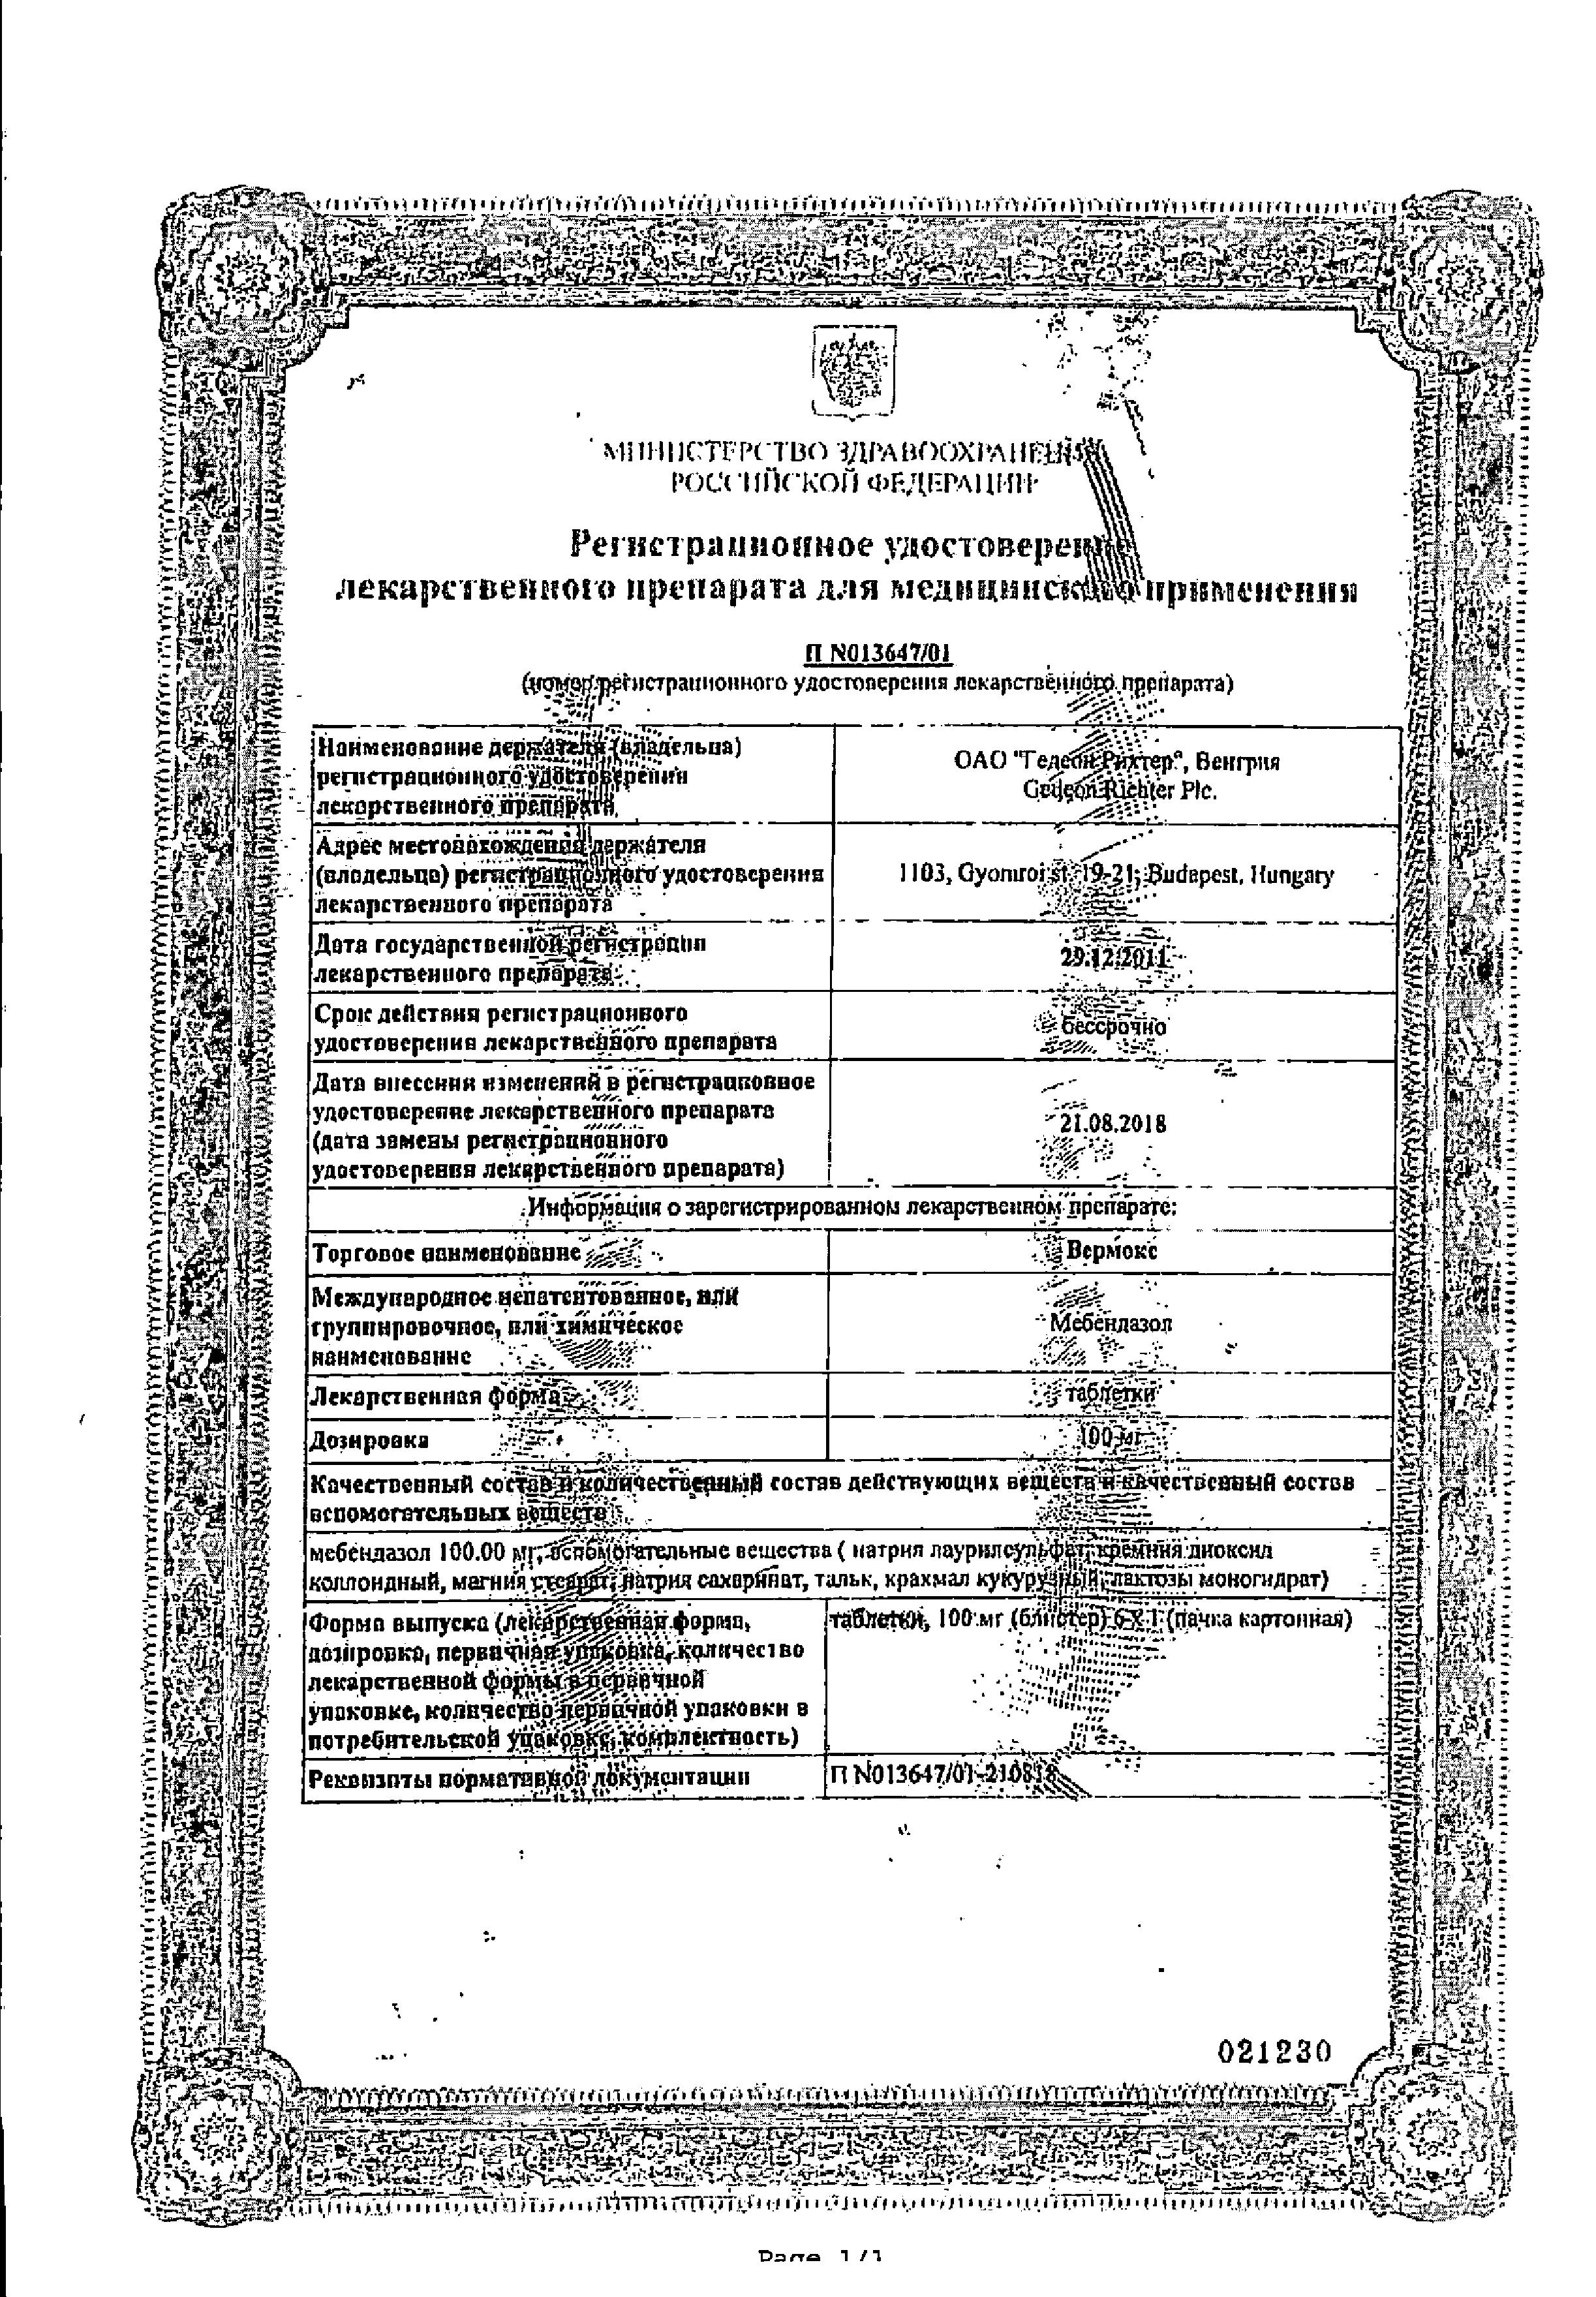 Вермокс сертификат